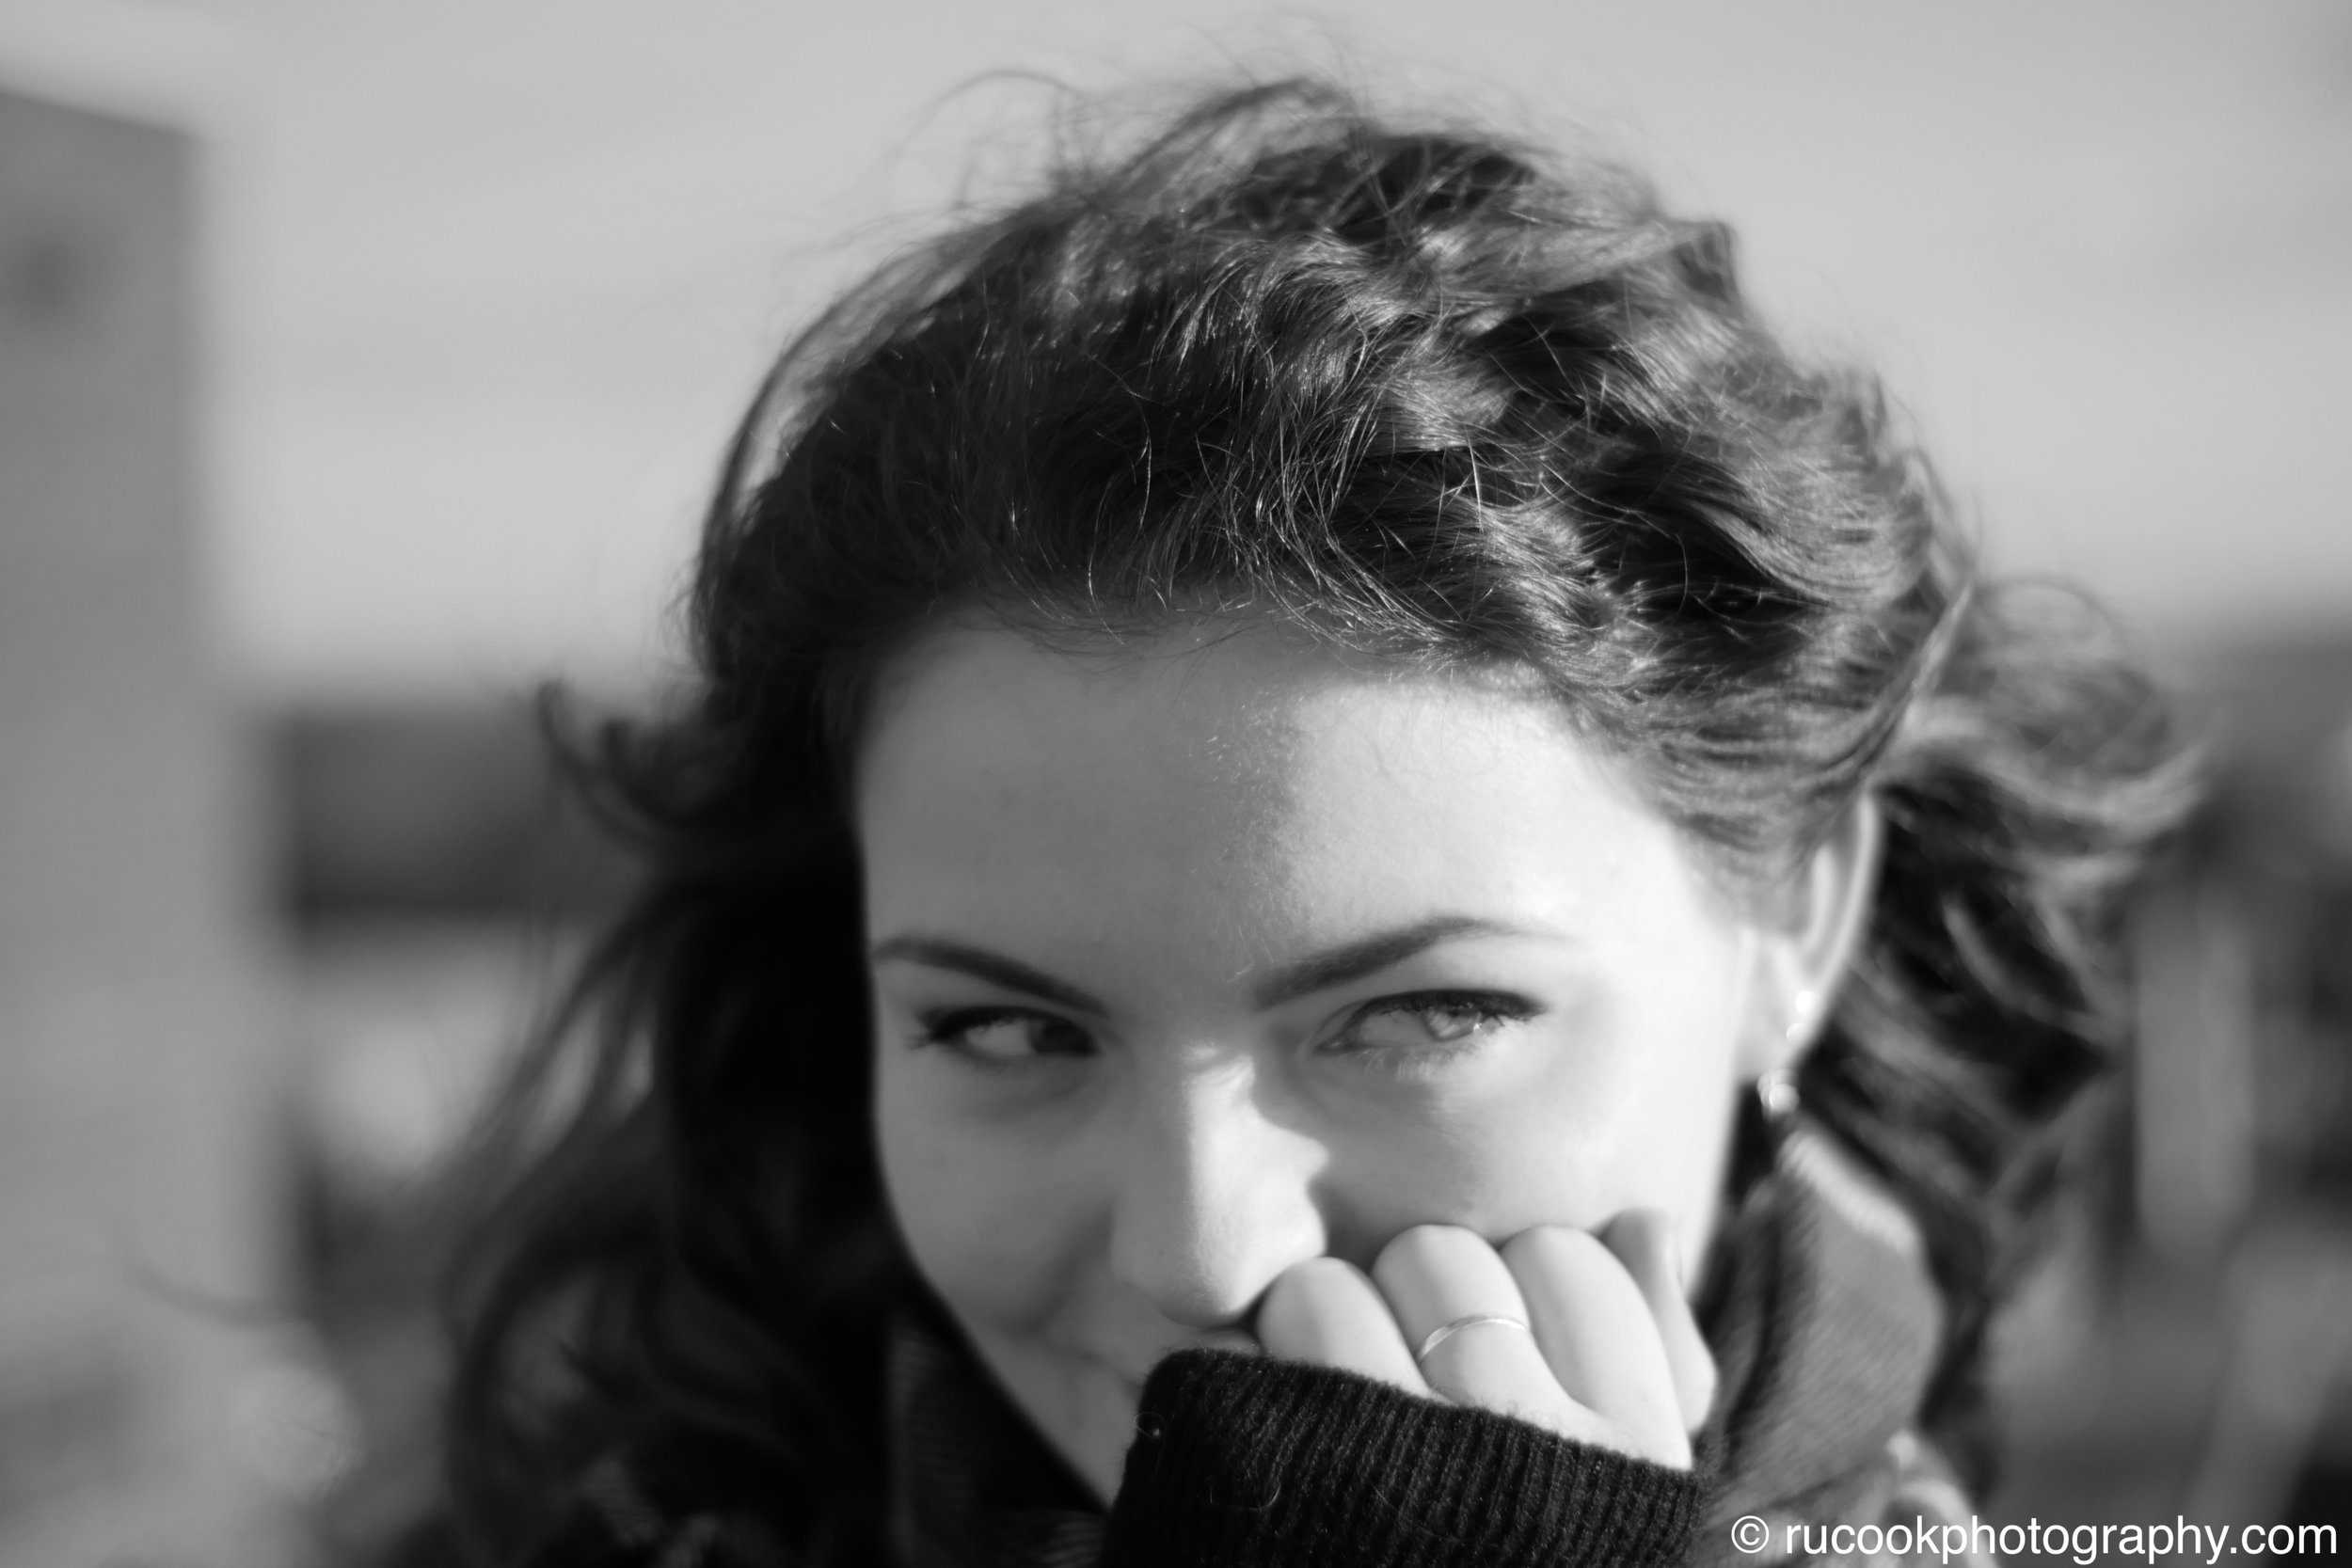 Model: Laura Harbard